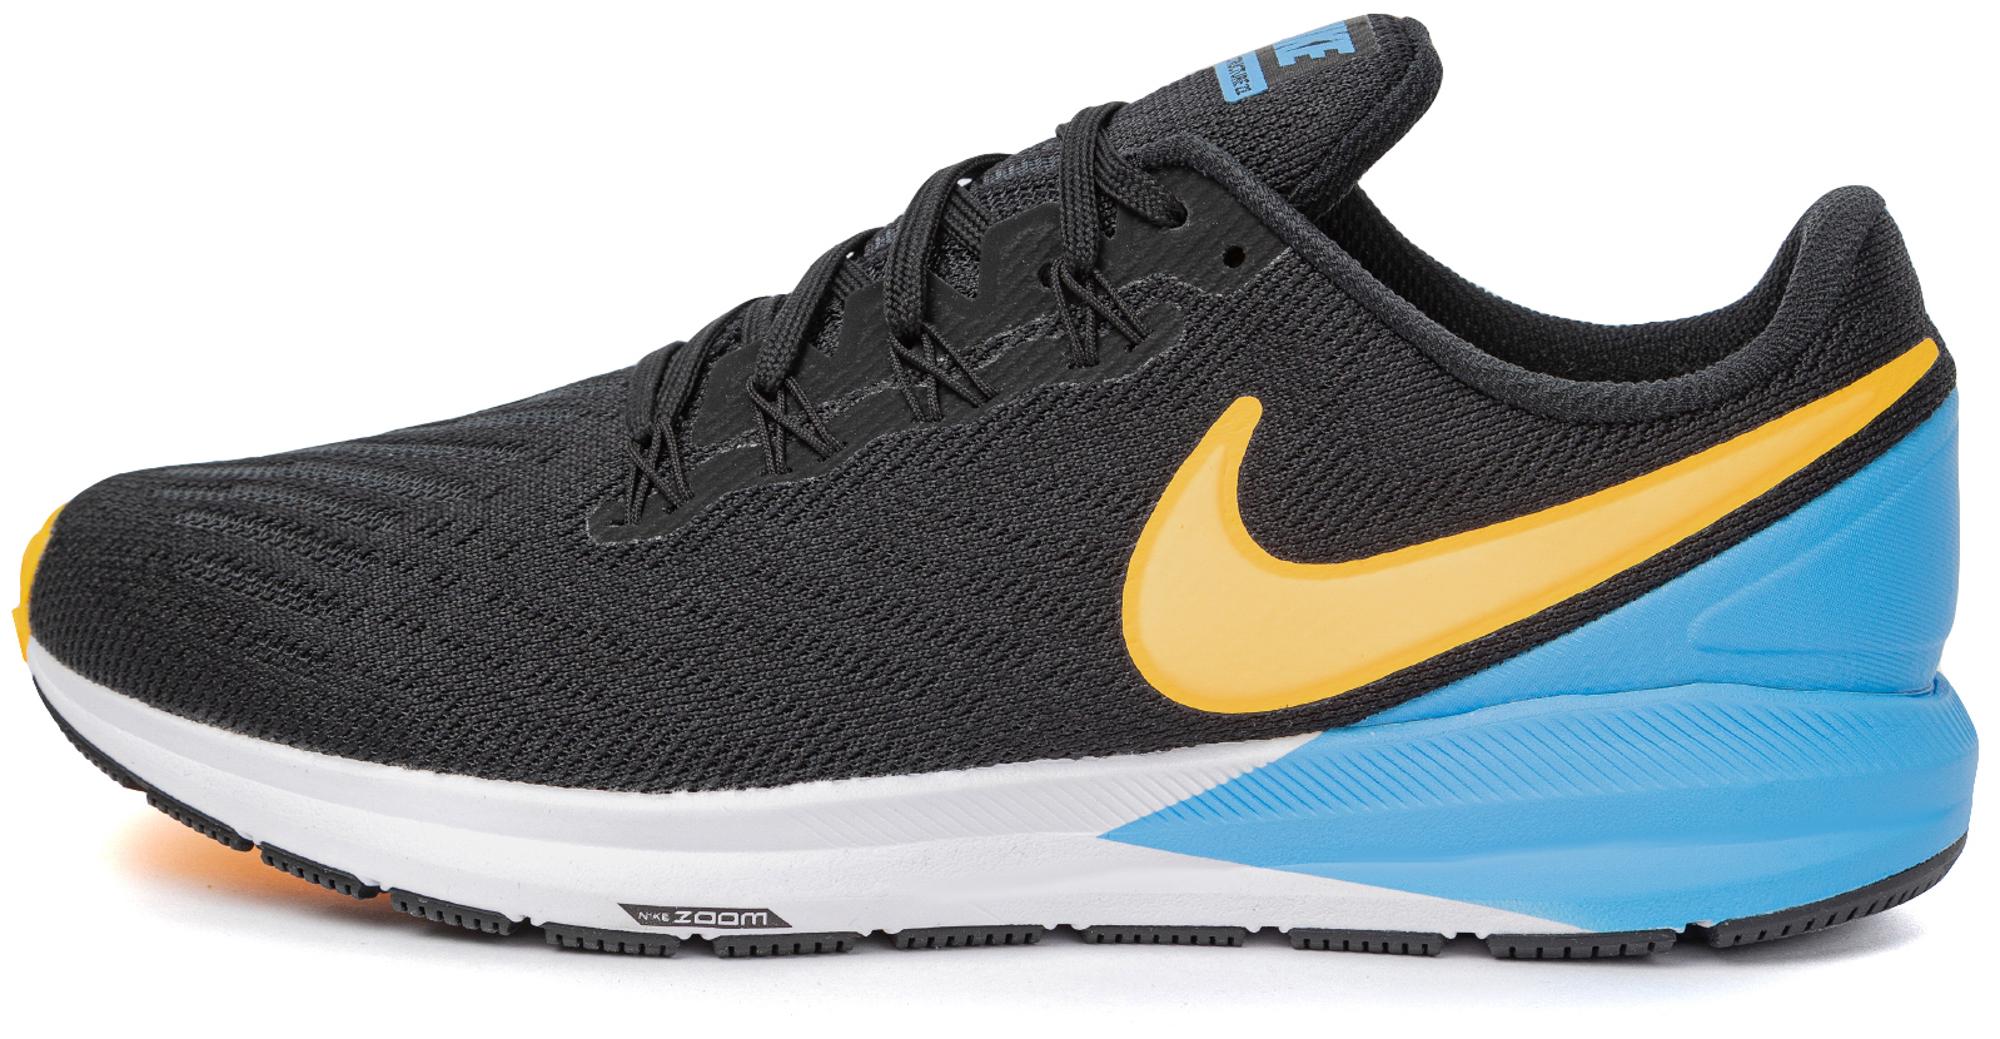 Фото - Nike Кроссовки мужские Nike Air Zoom Structure 22, размер 39.5 кроссовки nike sb zoom stefan janoski